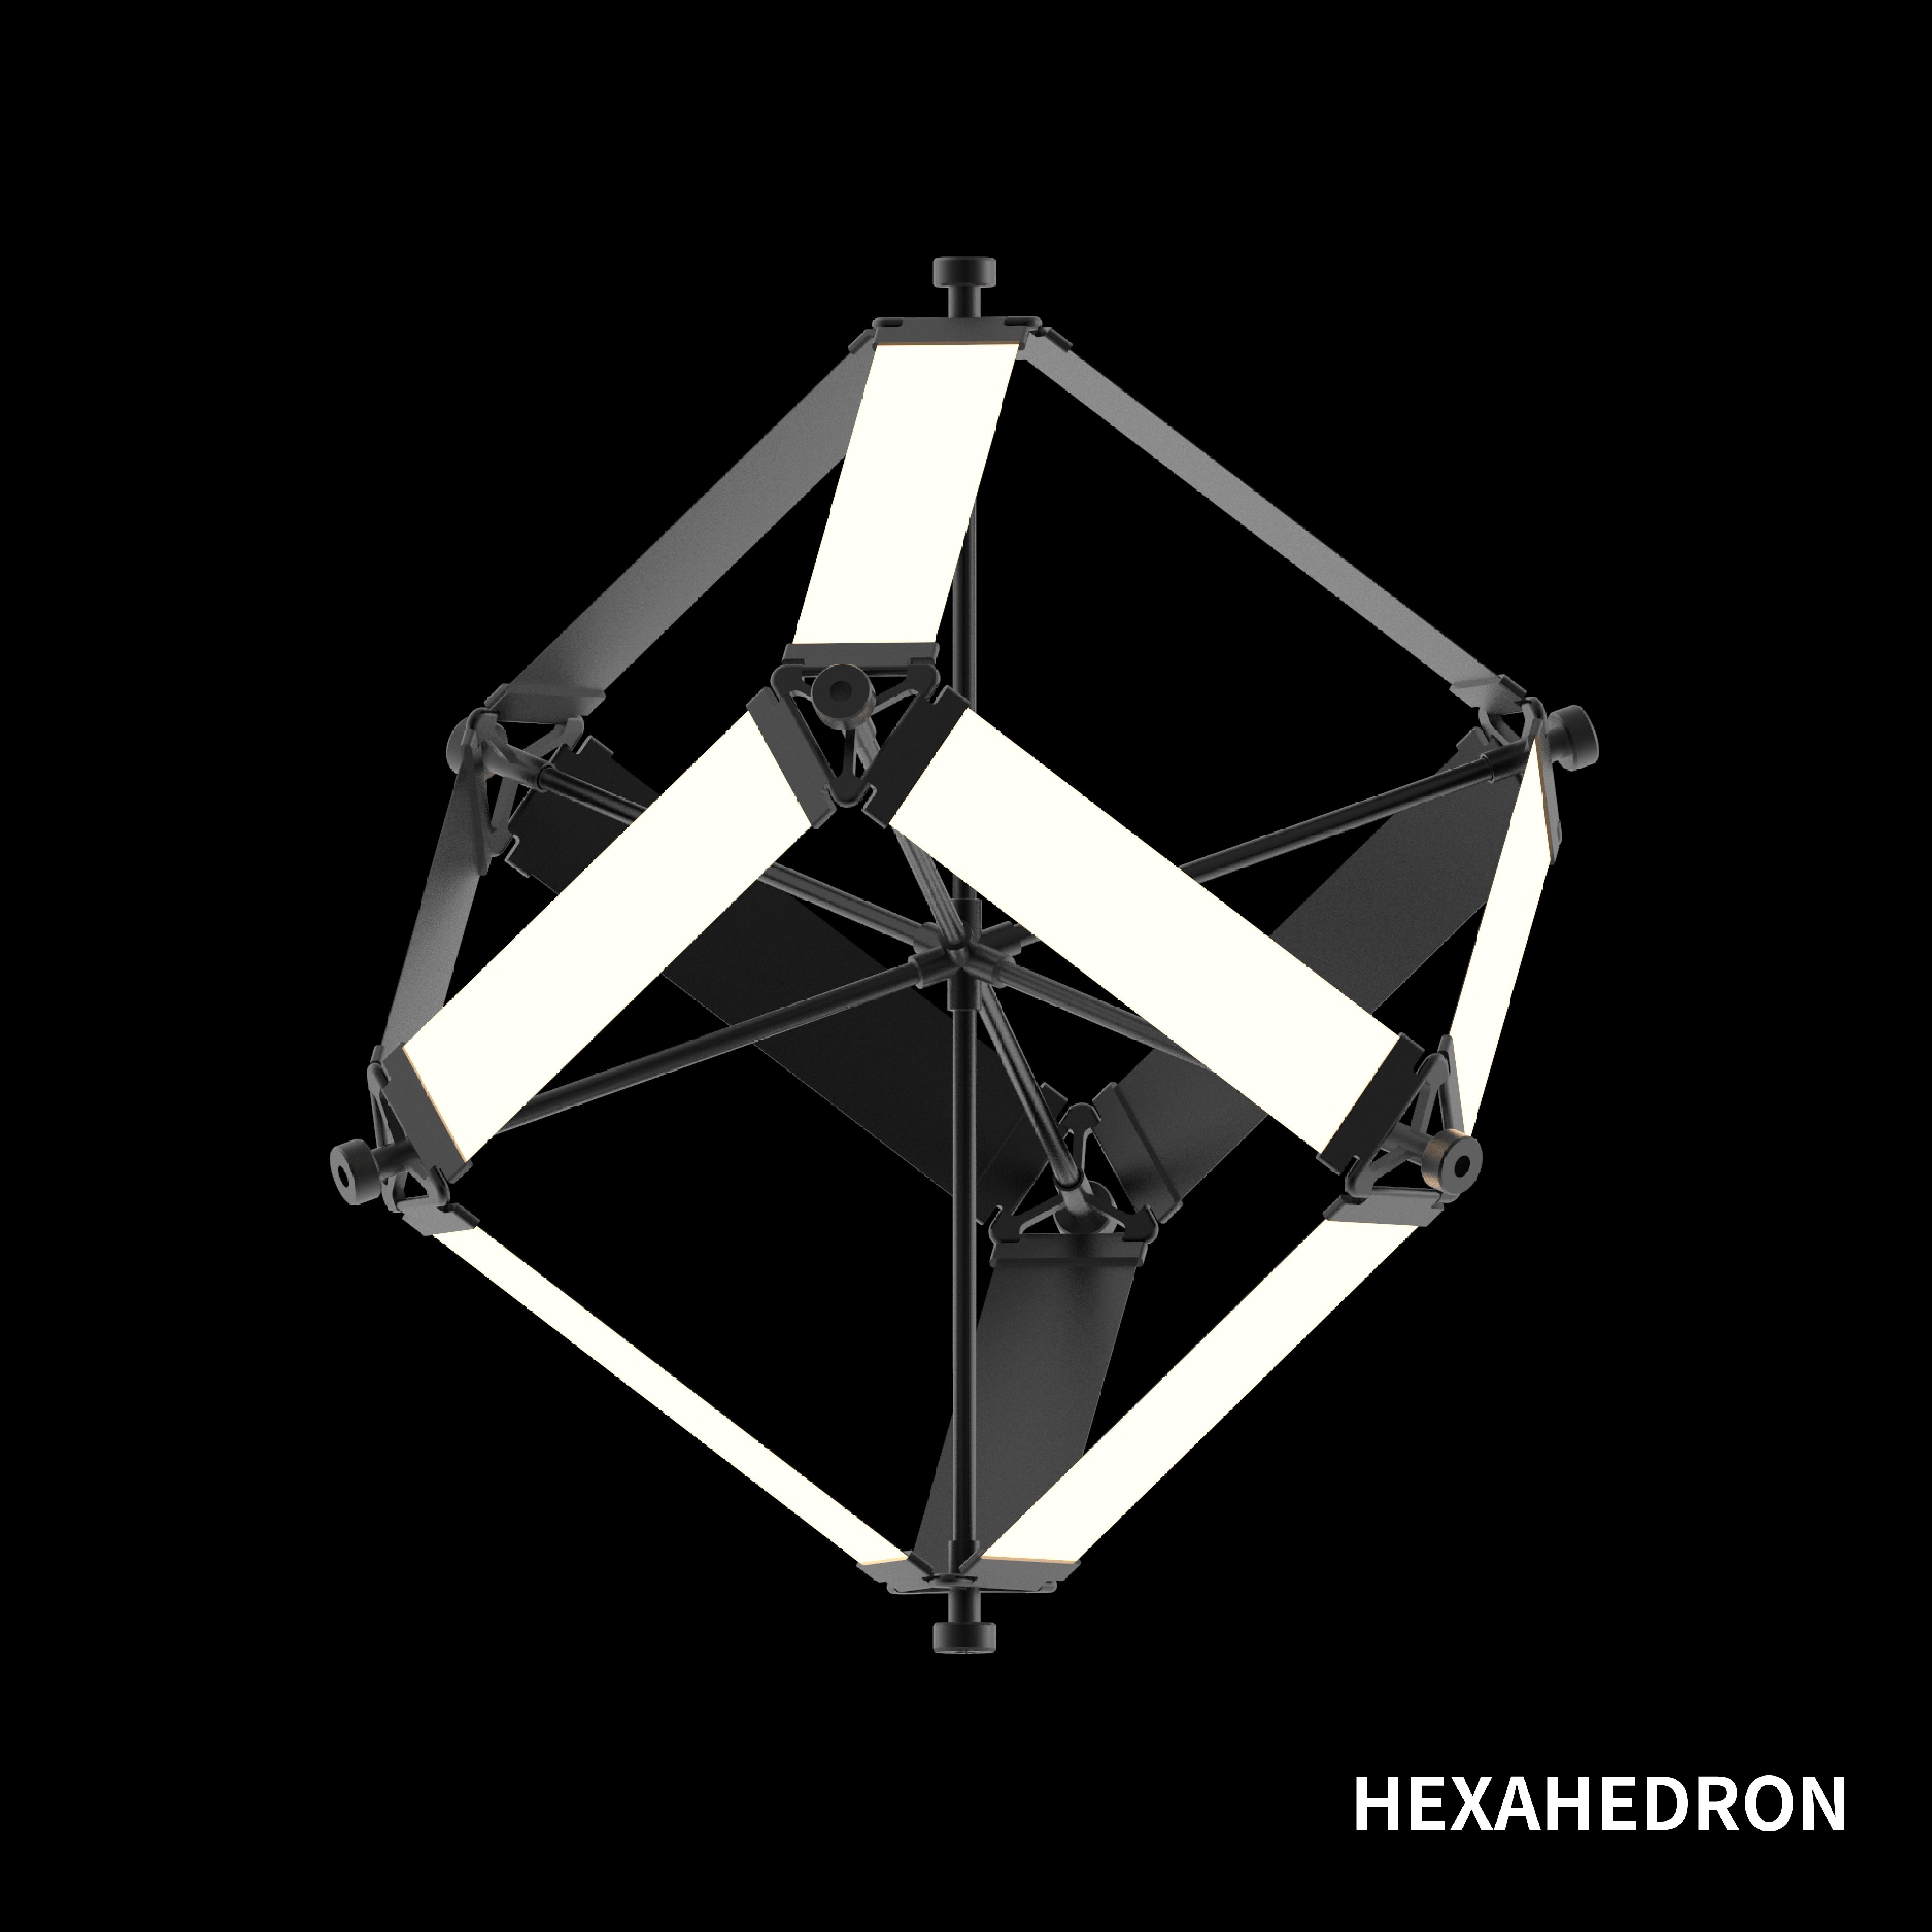 LG Geometry_Behance-08